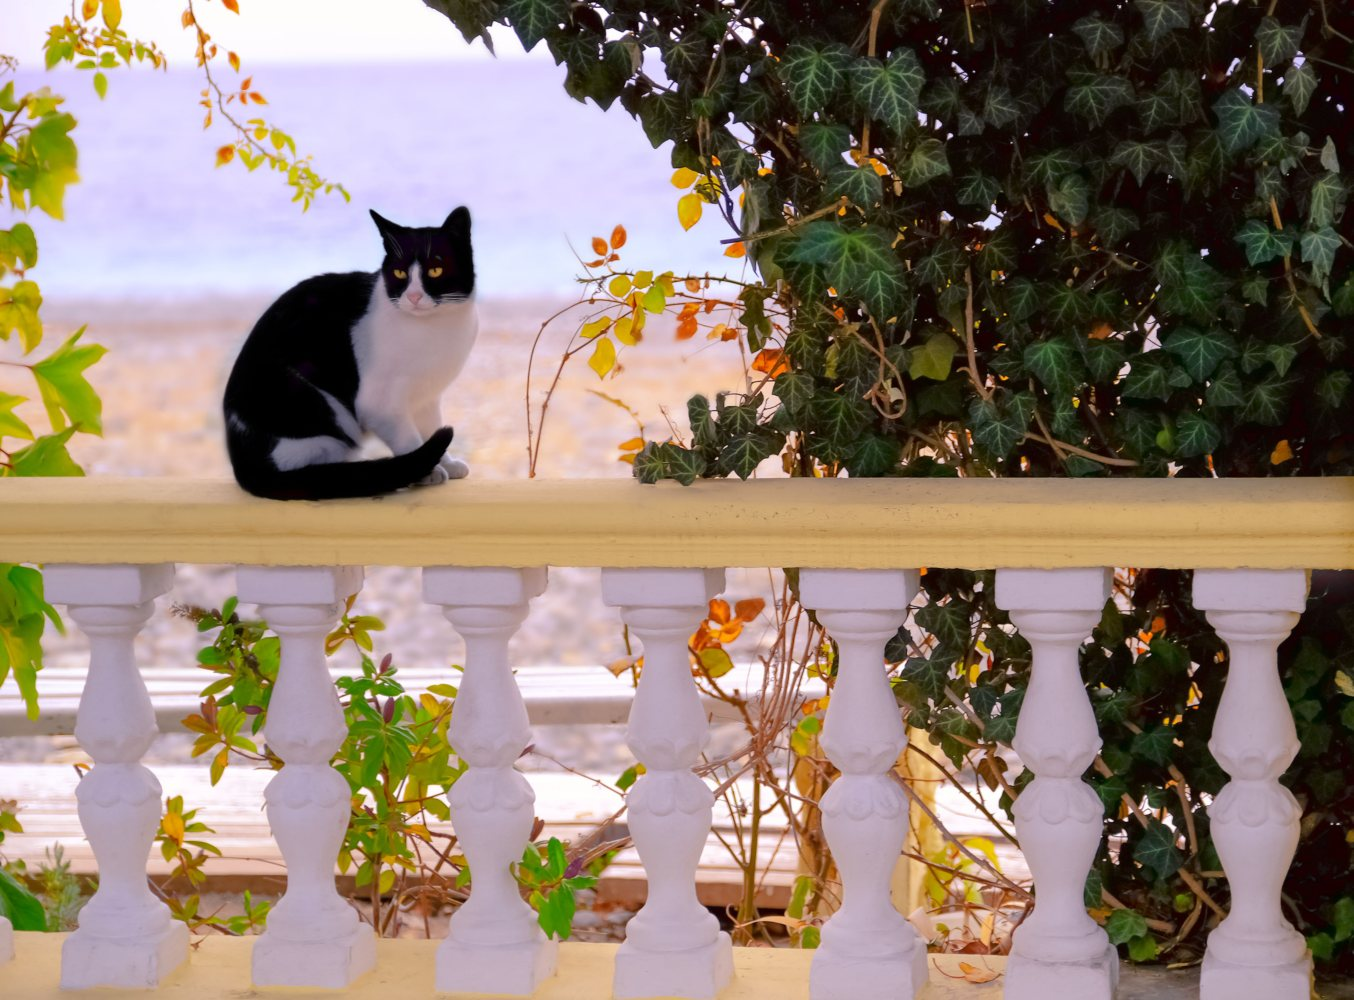 Gato numa varanda